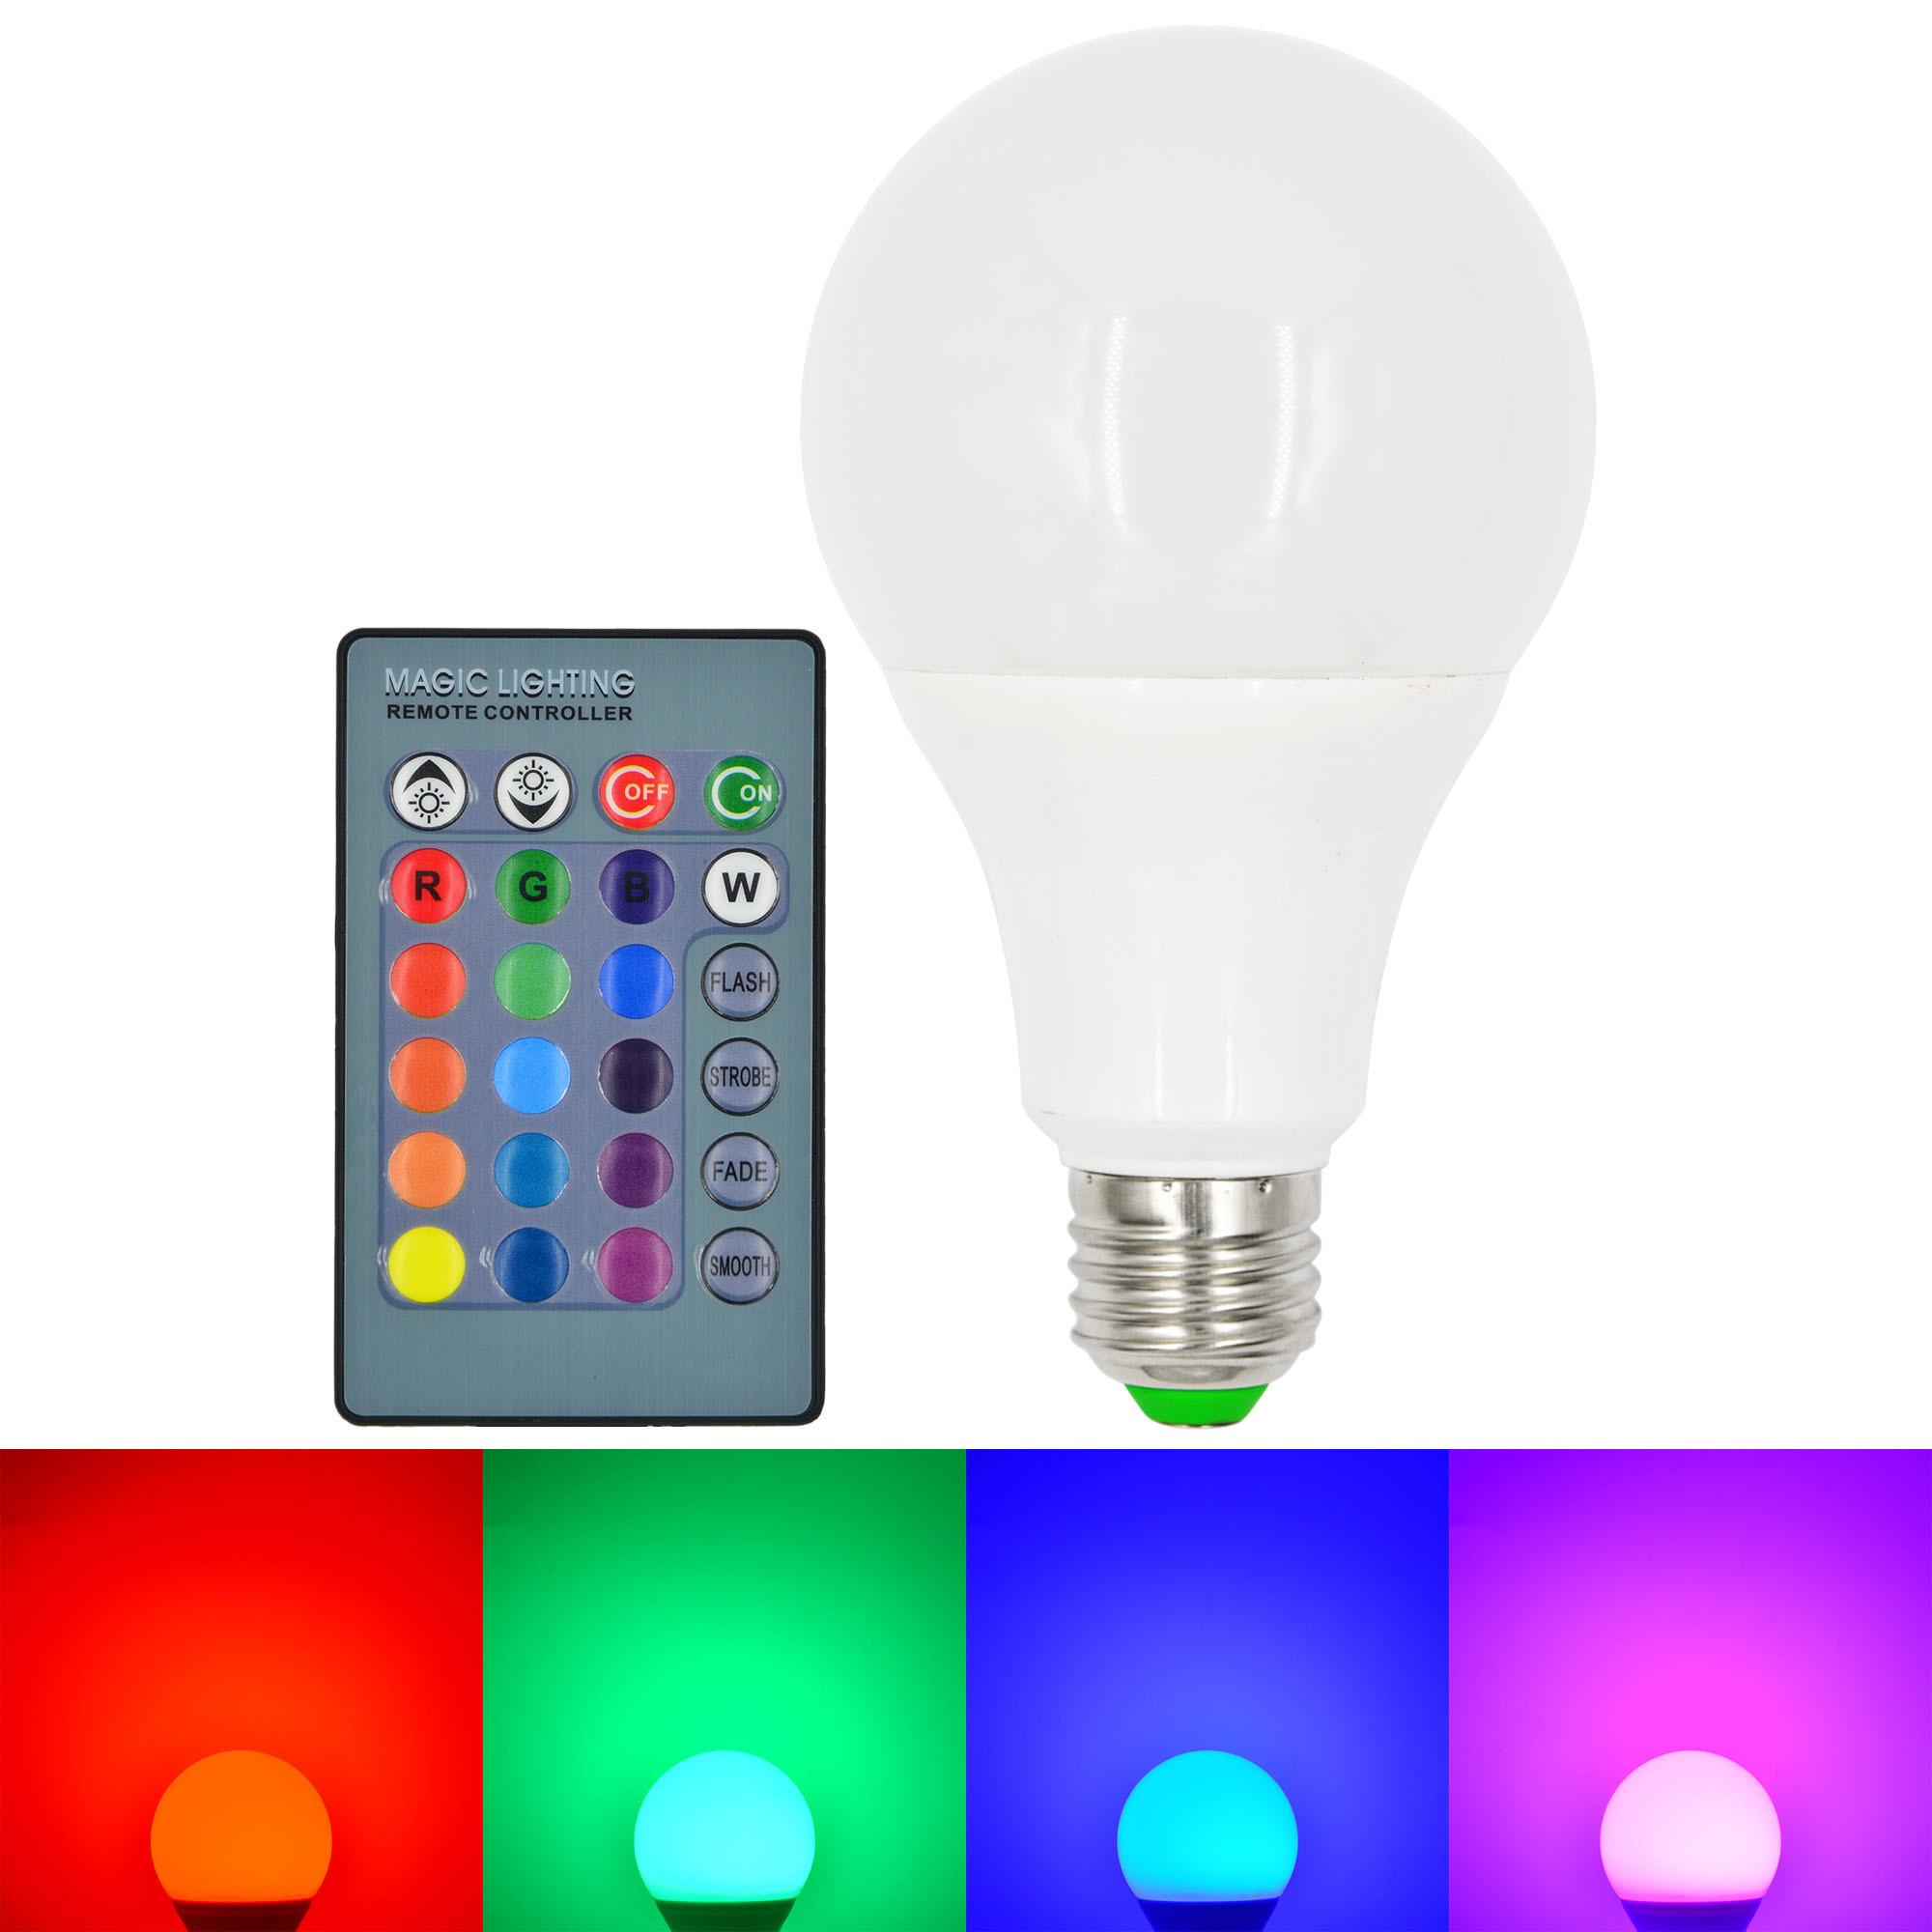 e27 10w led rgb globe light 16 colors changing led globe lamp bulb ir remote led lights. Black Bedroom Furniture Sets. Home Design Ideas